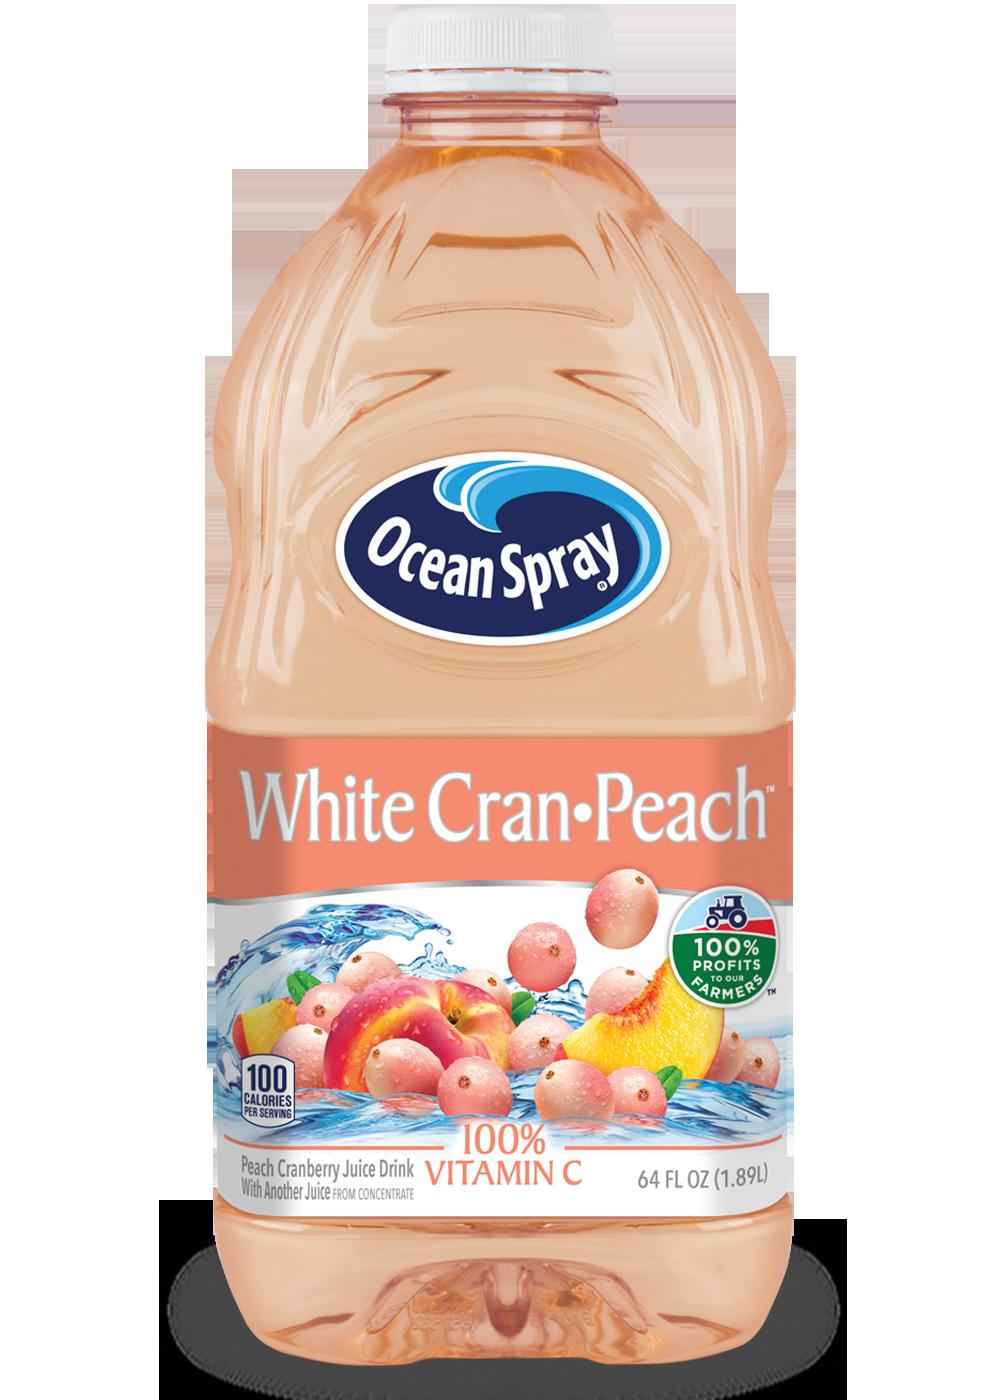 White Cran•Peach® White Cranberry and Peach Juice Drink